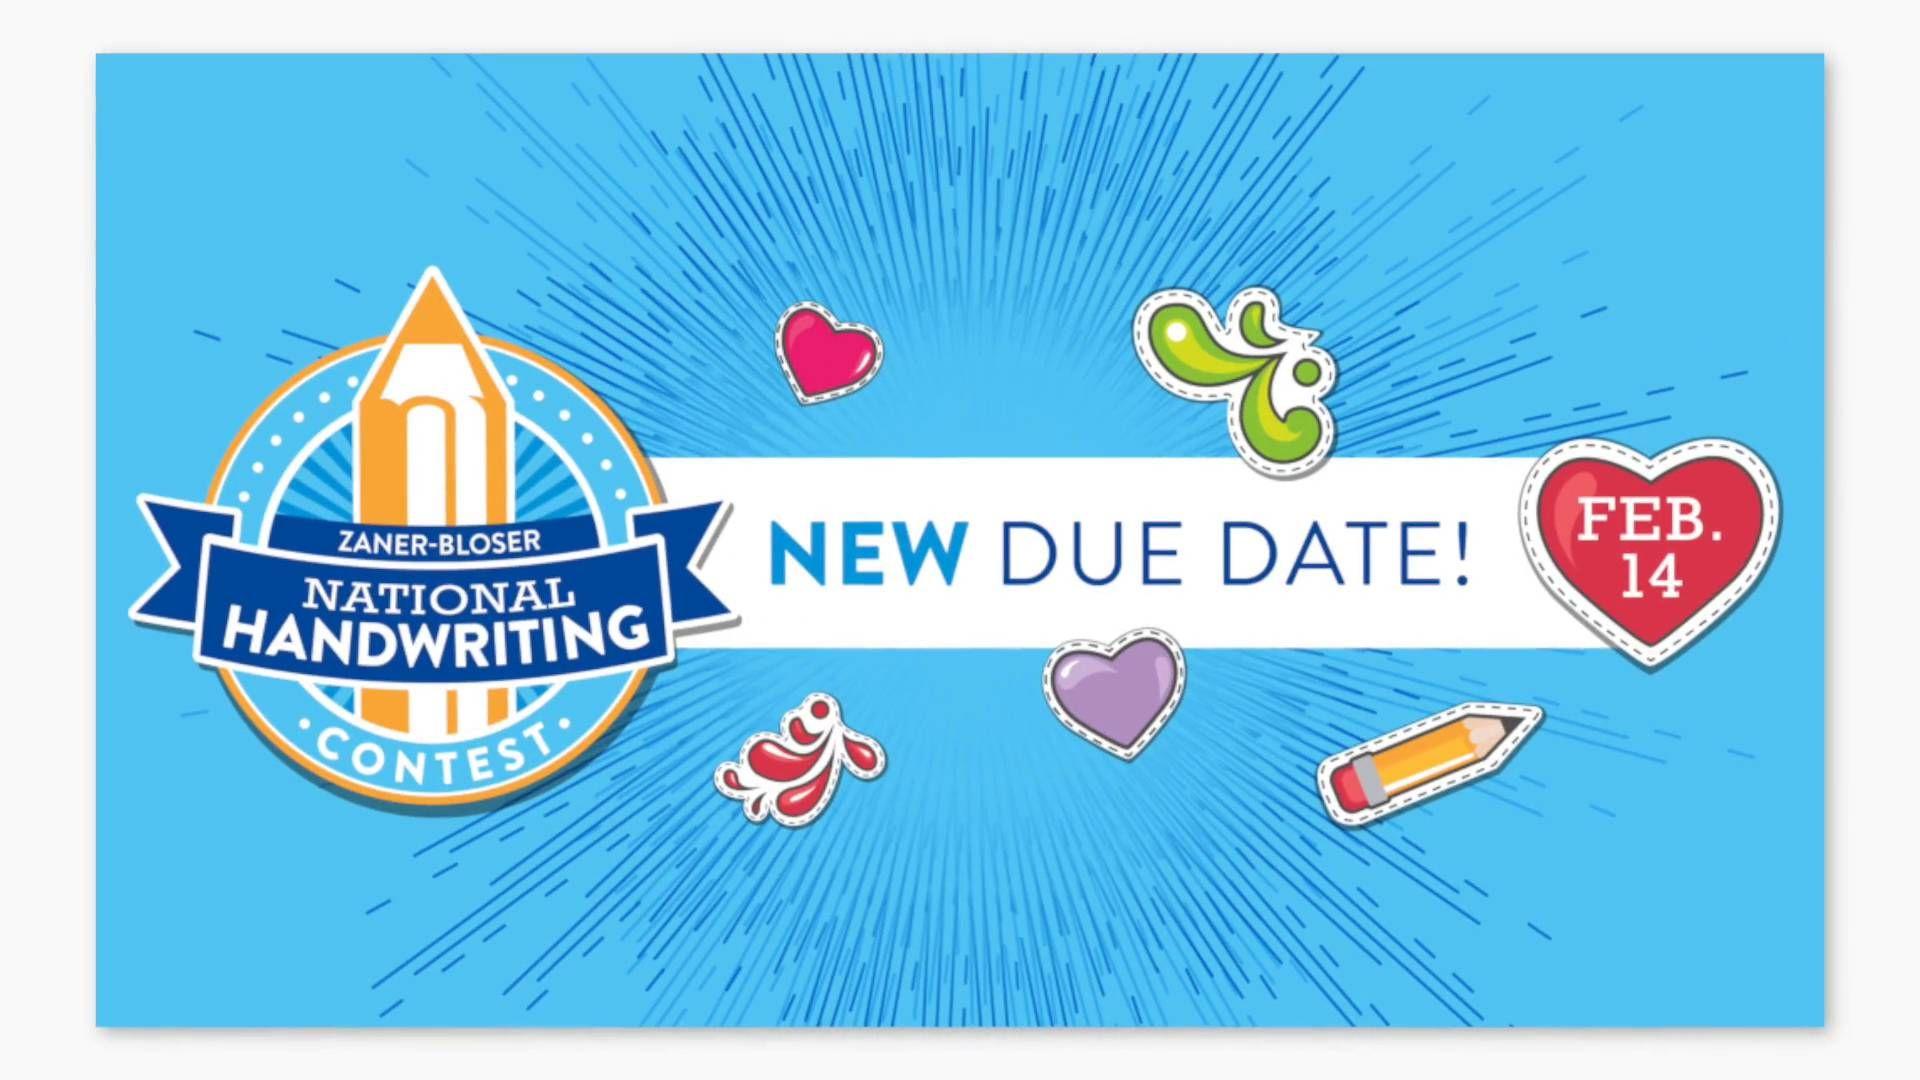 National Handwriting Contest